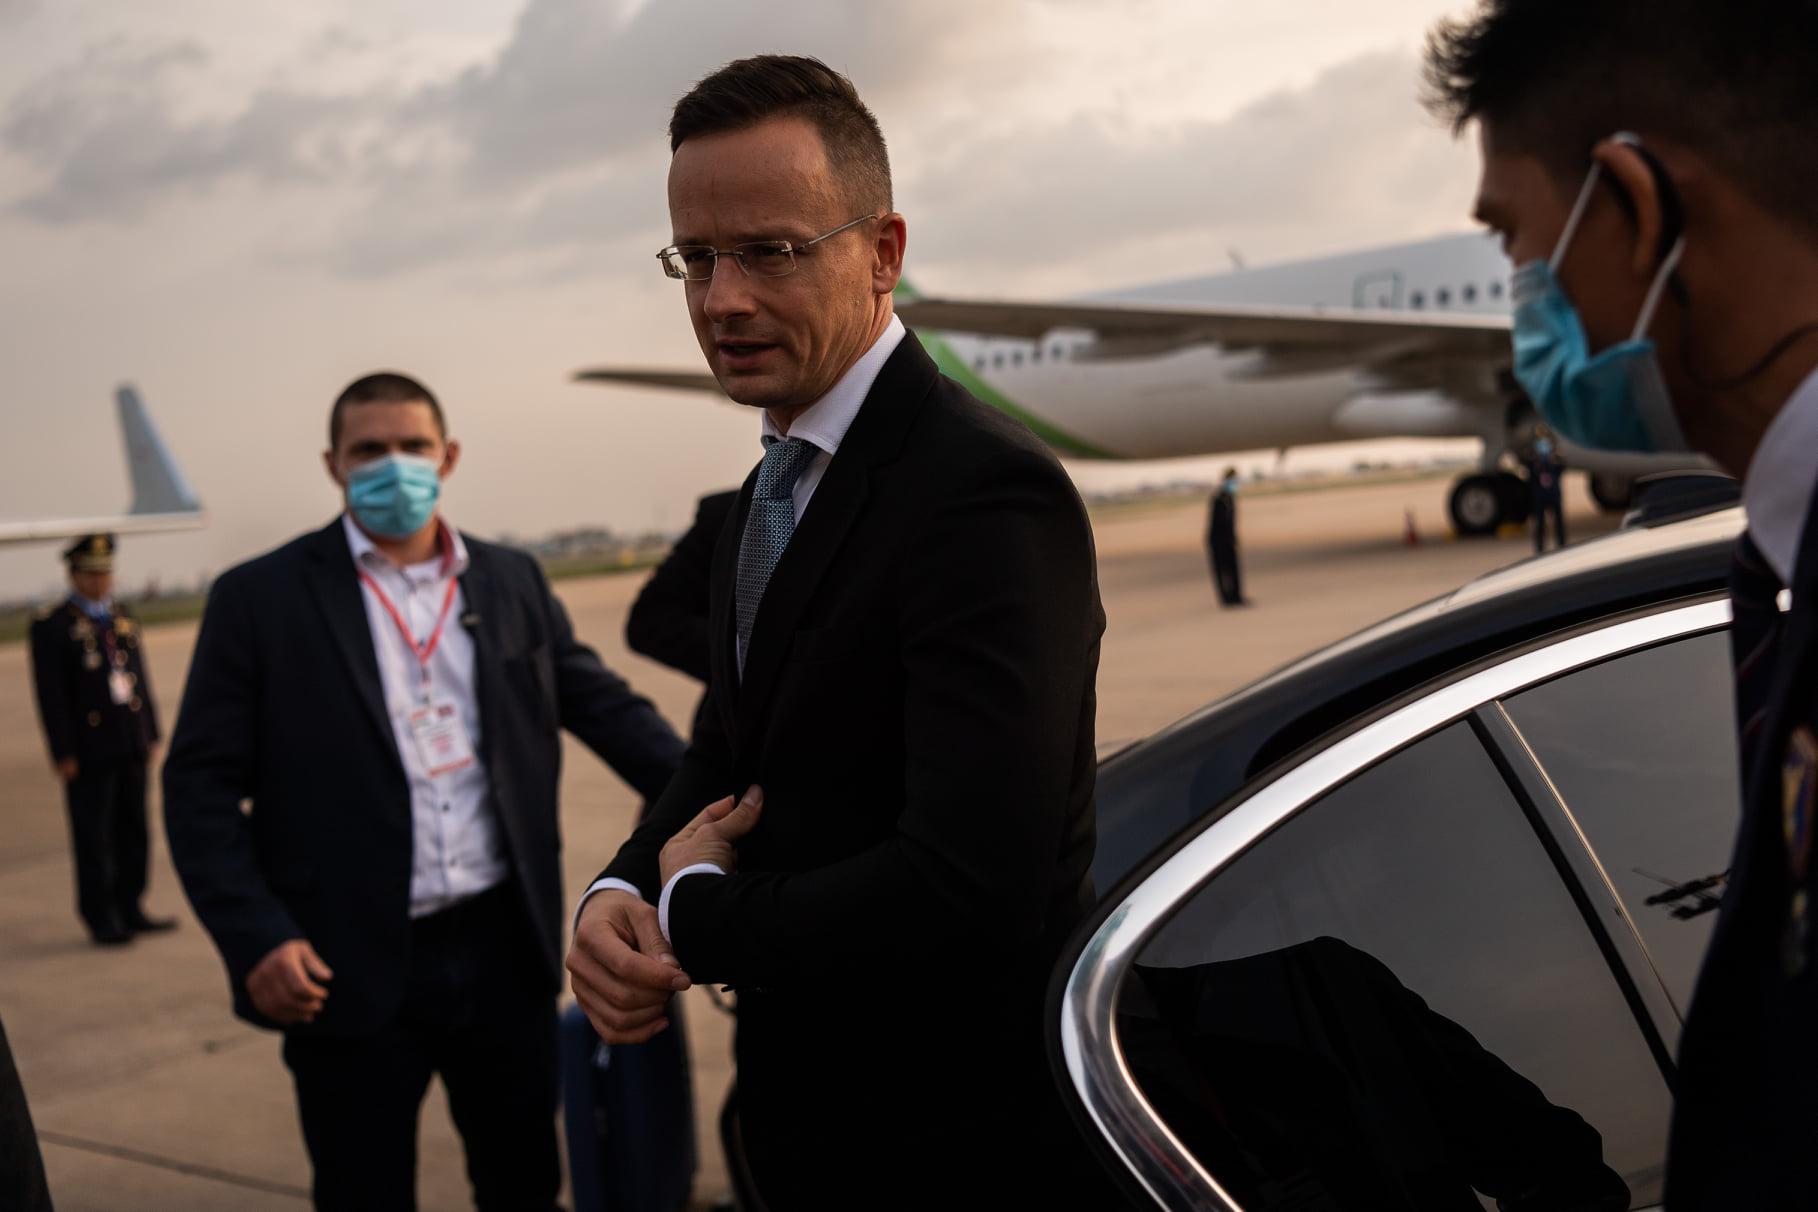 Foreign Ministry Refutes Claims that FM Szijjártó Infected Politicians During Asia Trip